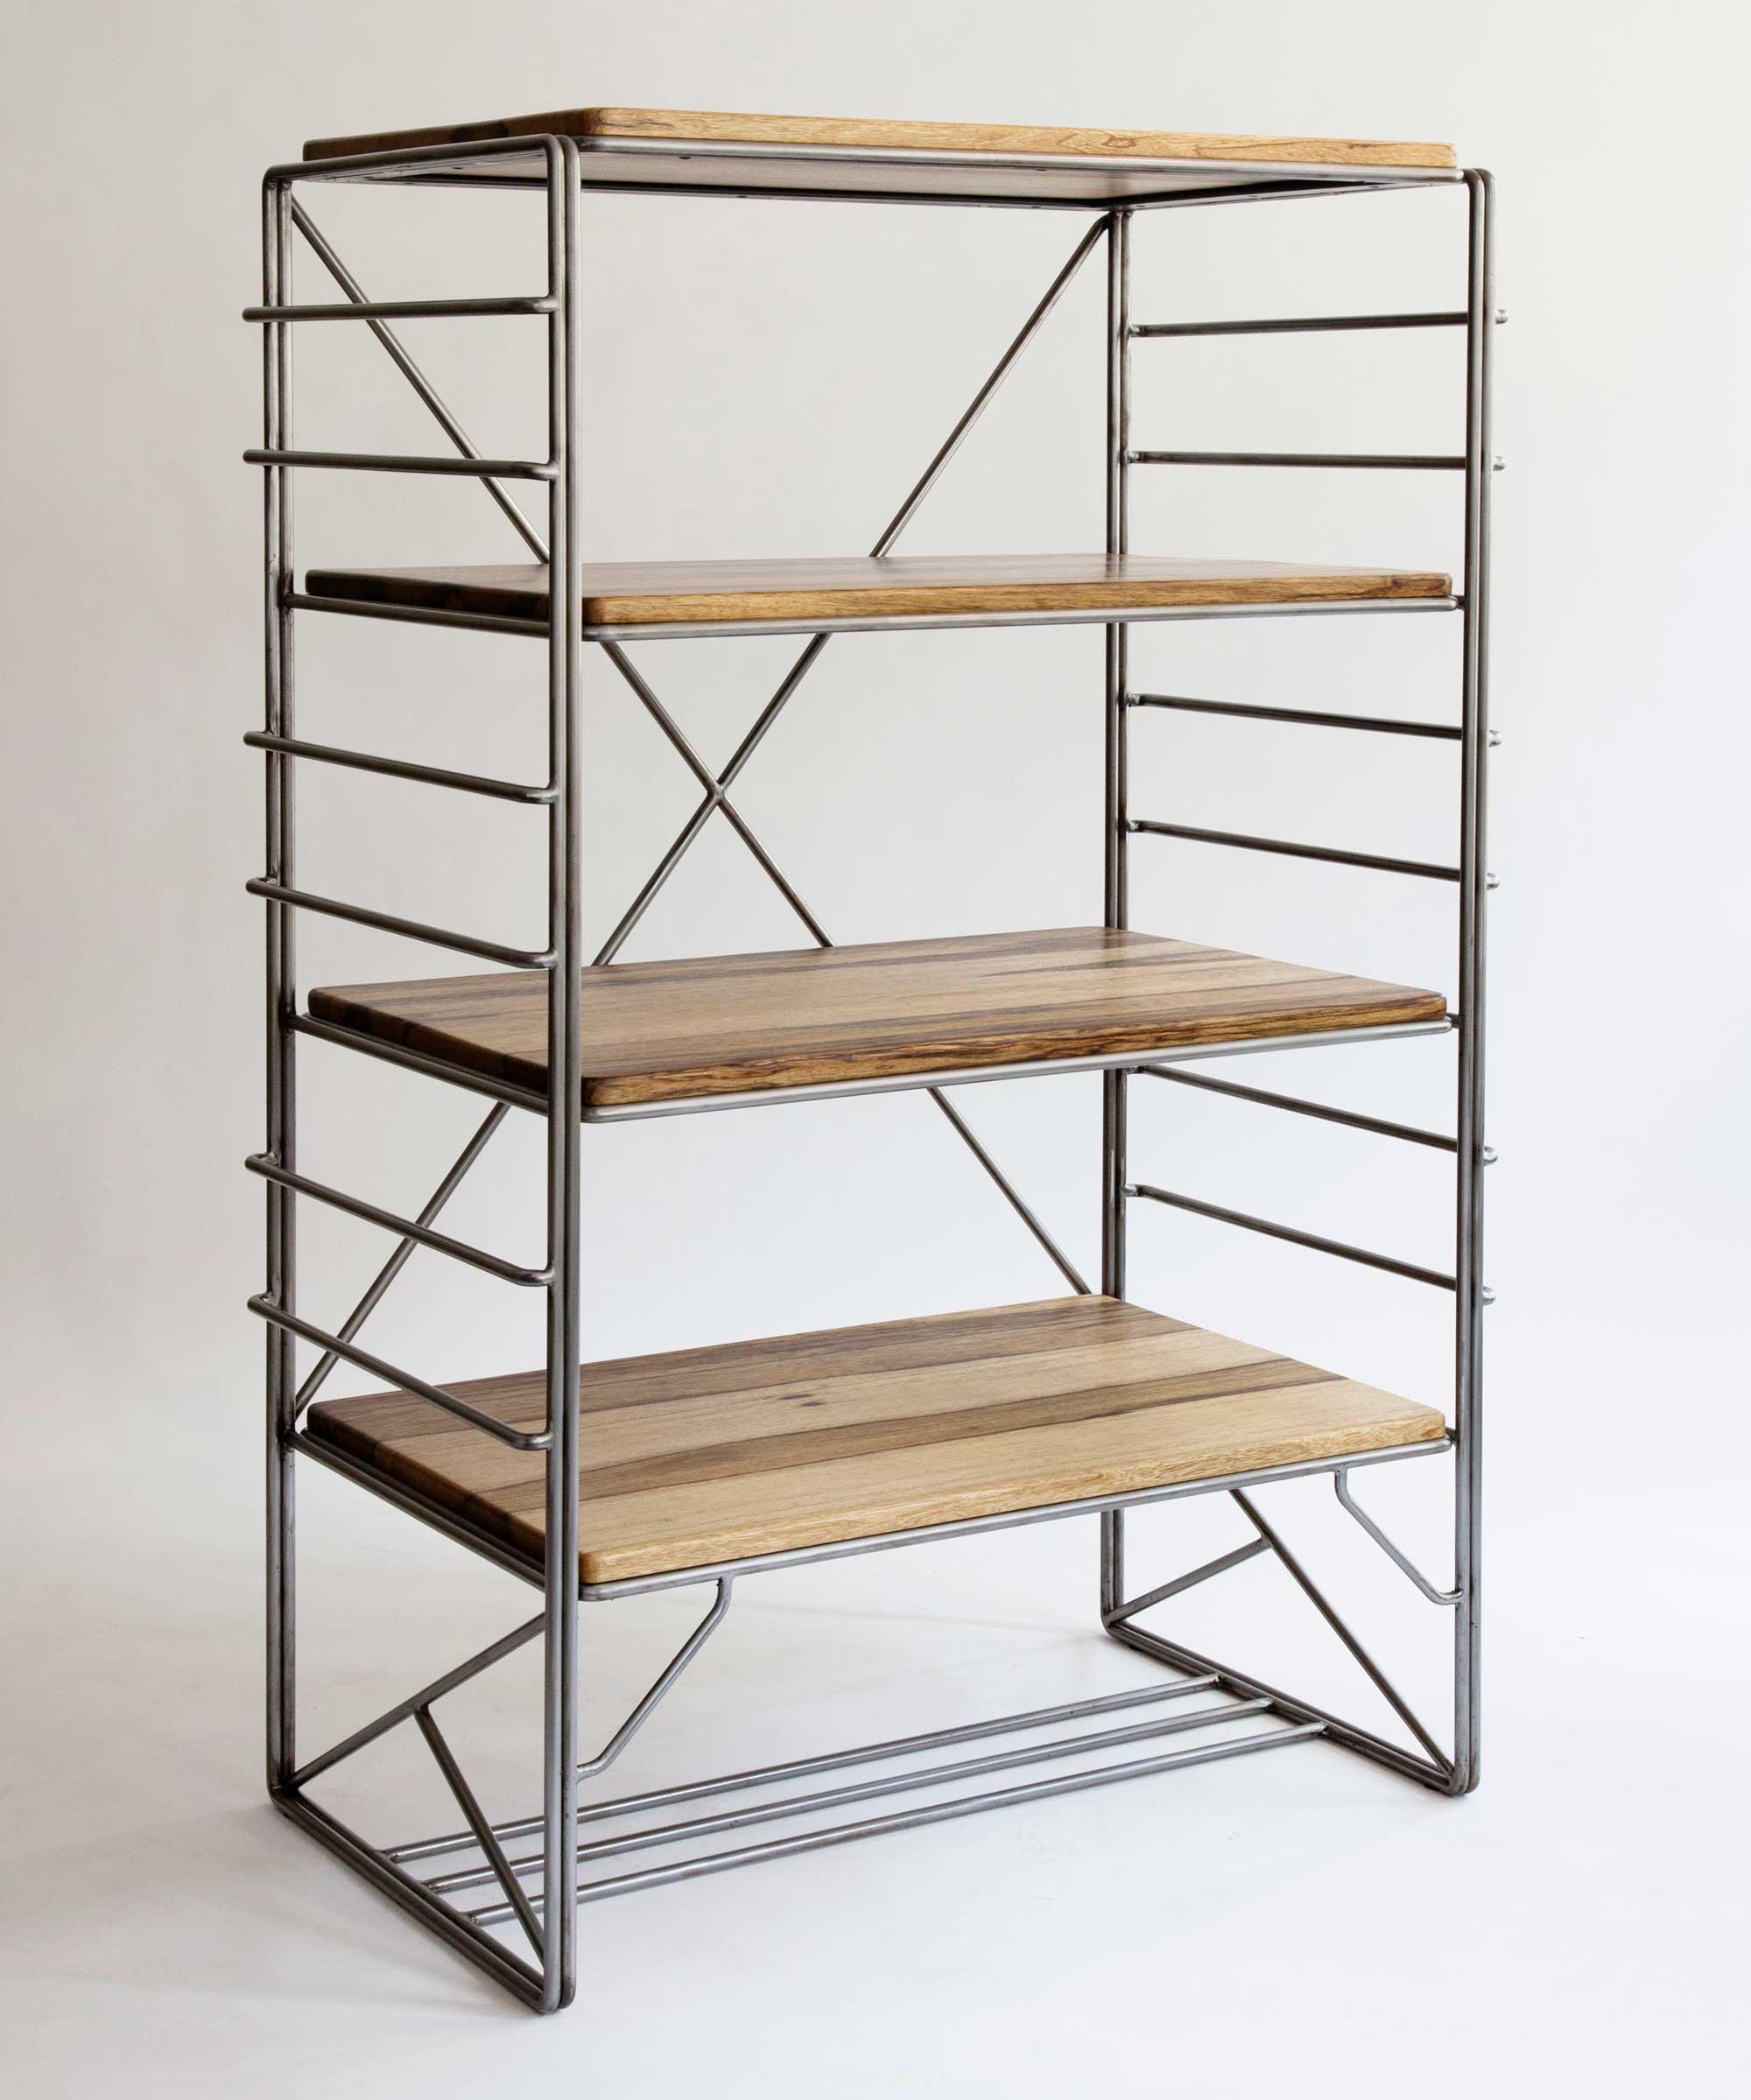 metal-and-wood-store-beirut-storage-shelves-wired-shelf.jpg